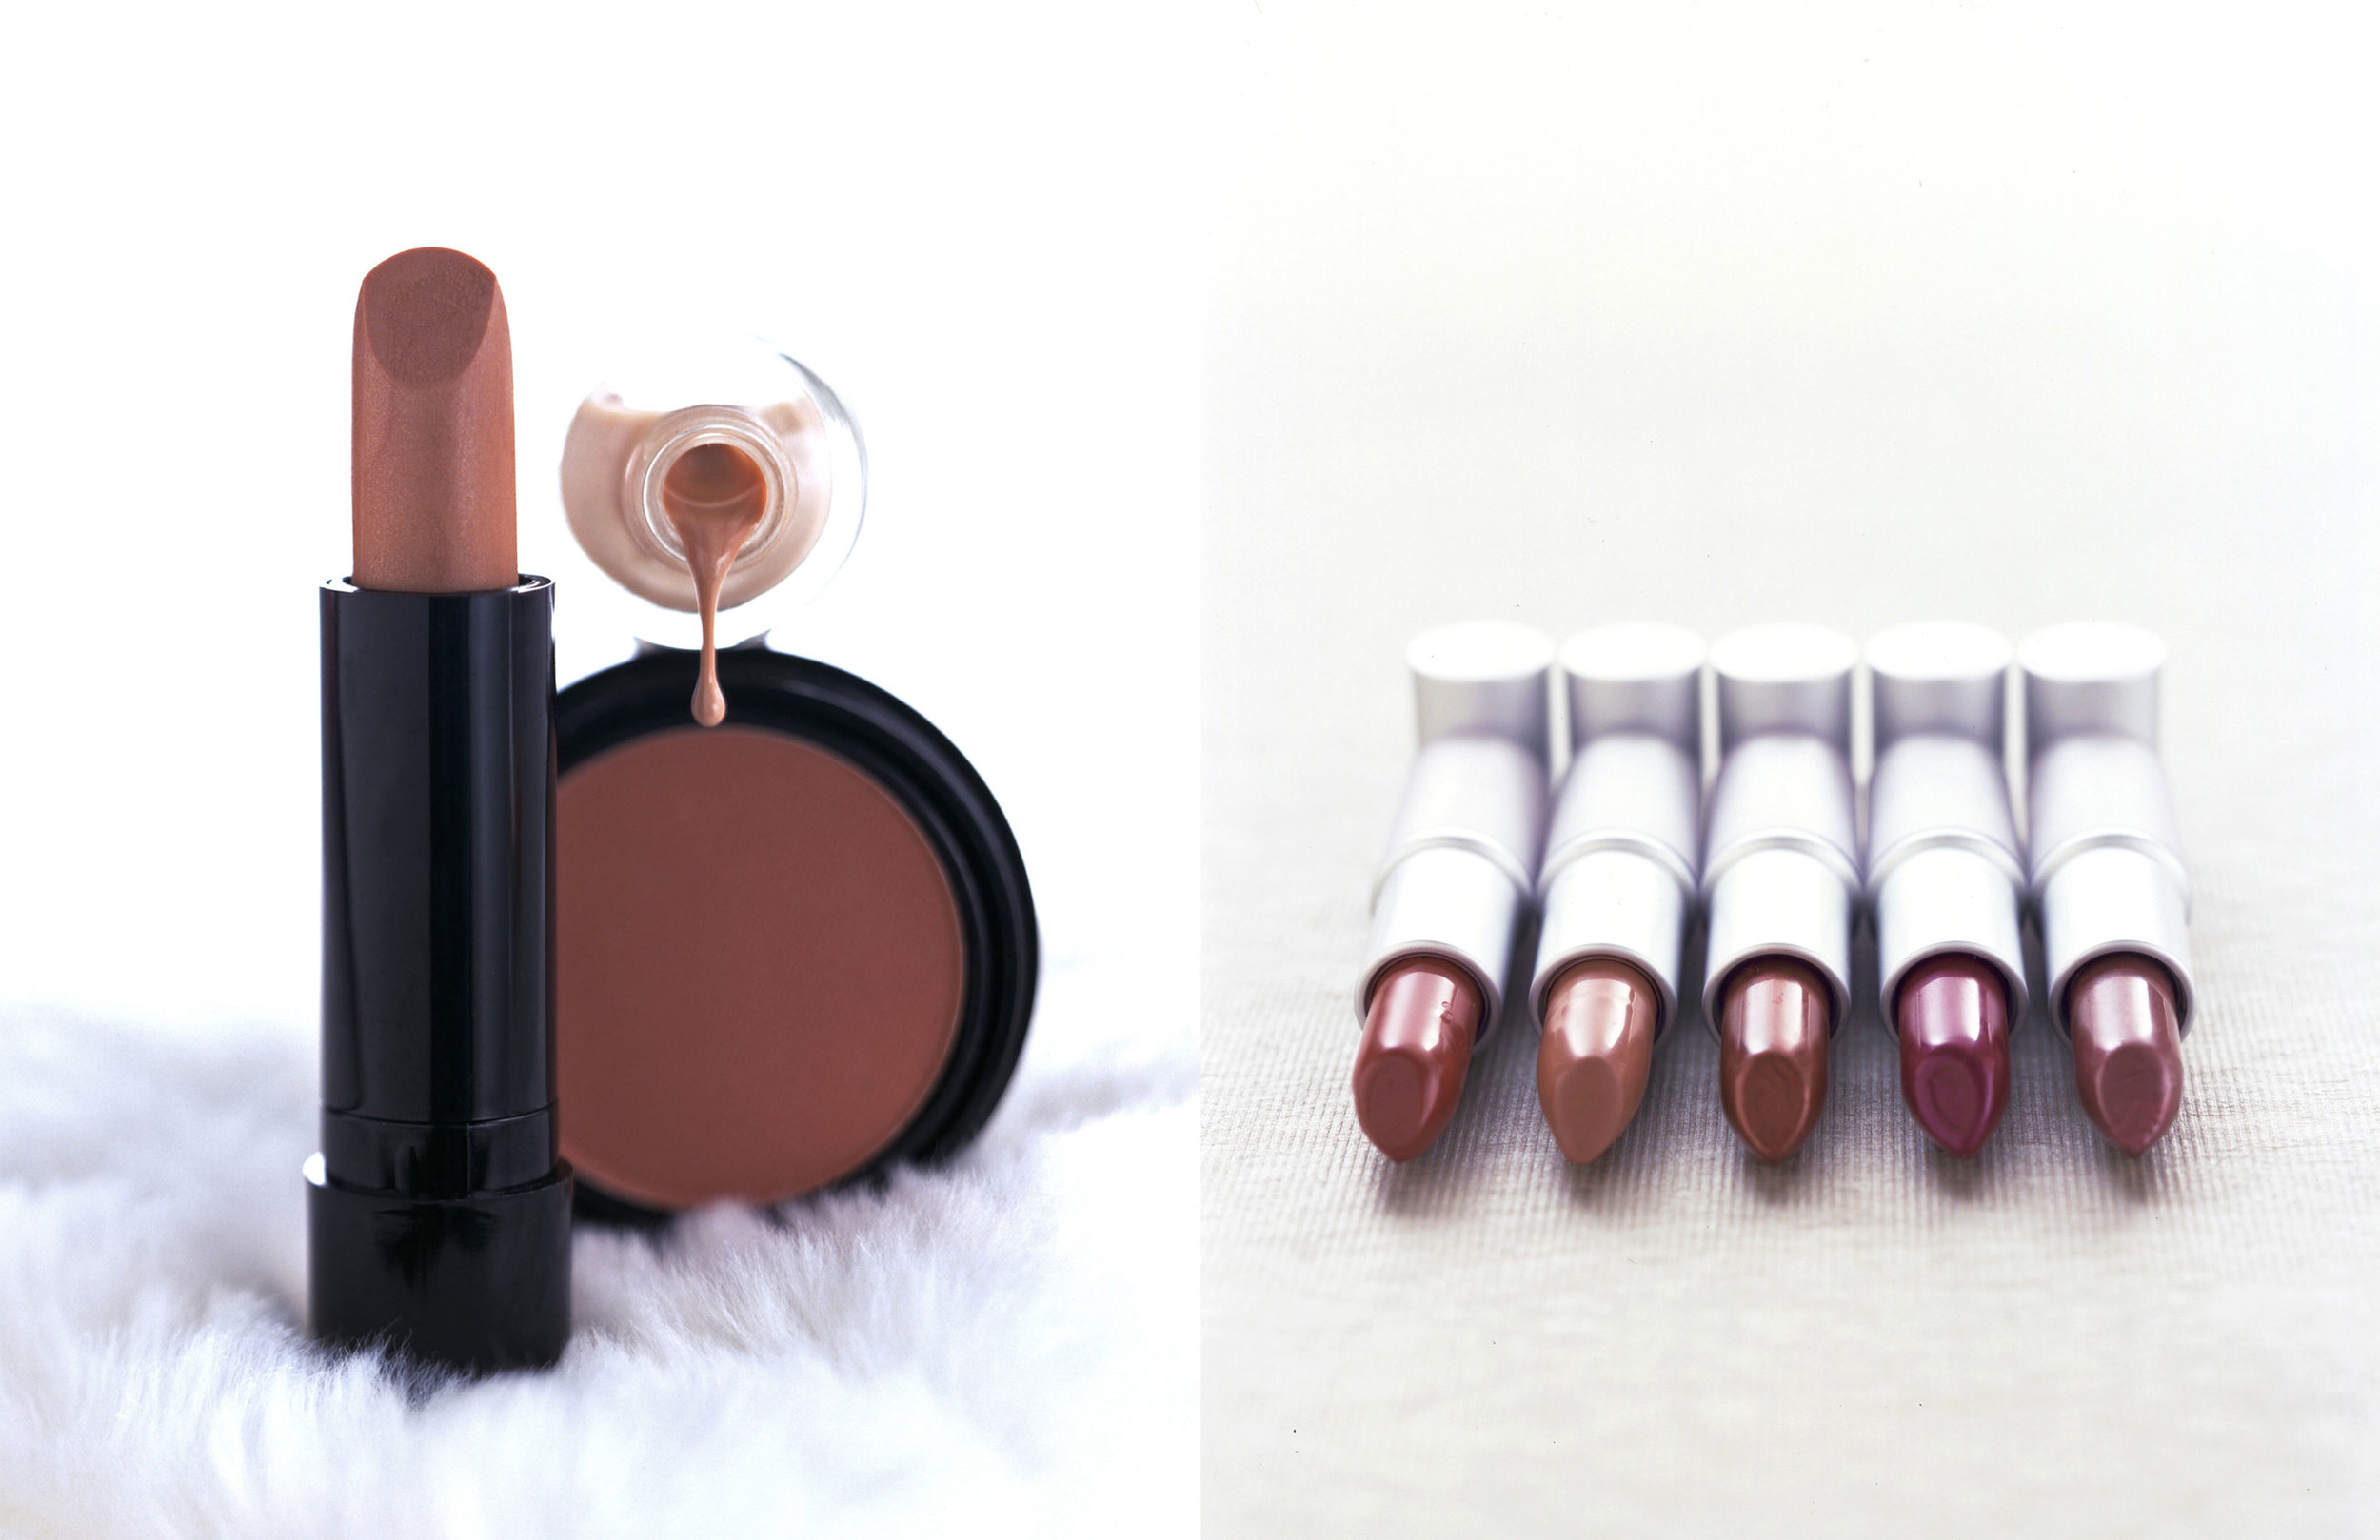 Troy_Forest_Nail_Polish_Drip_Lipstick.jpg